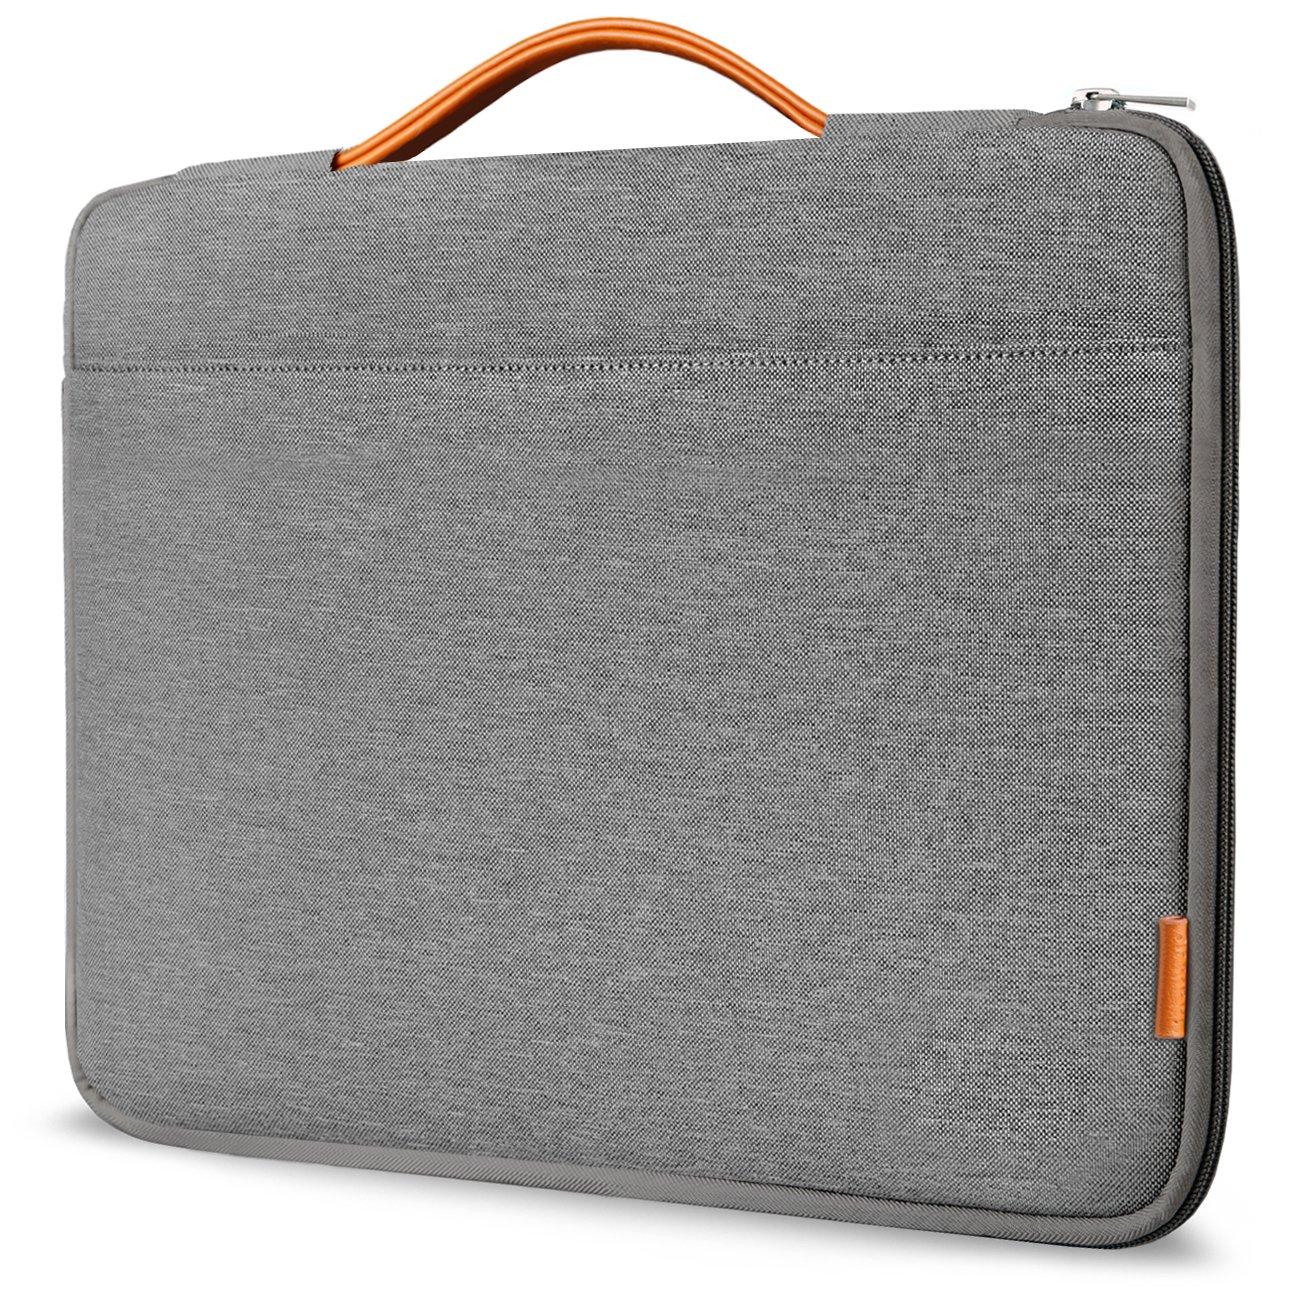 inateck 13 13 3 inch macbook air macbook pro pro retina. Black Bedroom Furniture Sets. Home Design Ideas